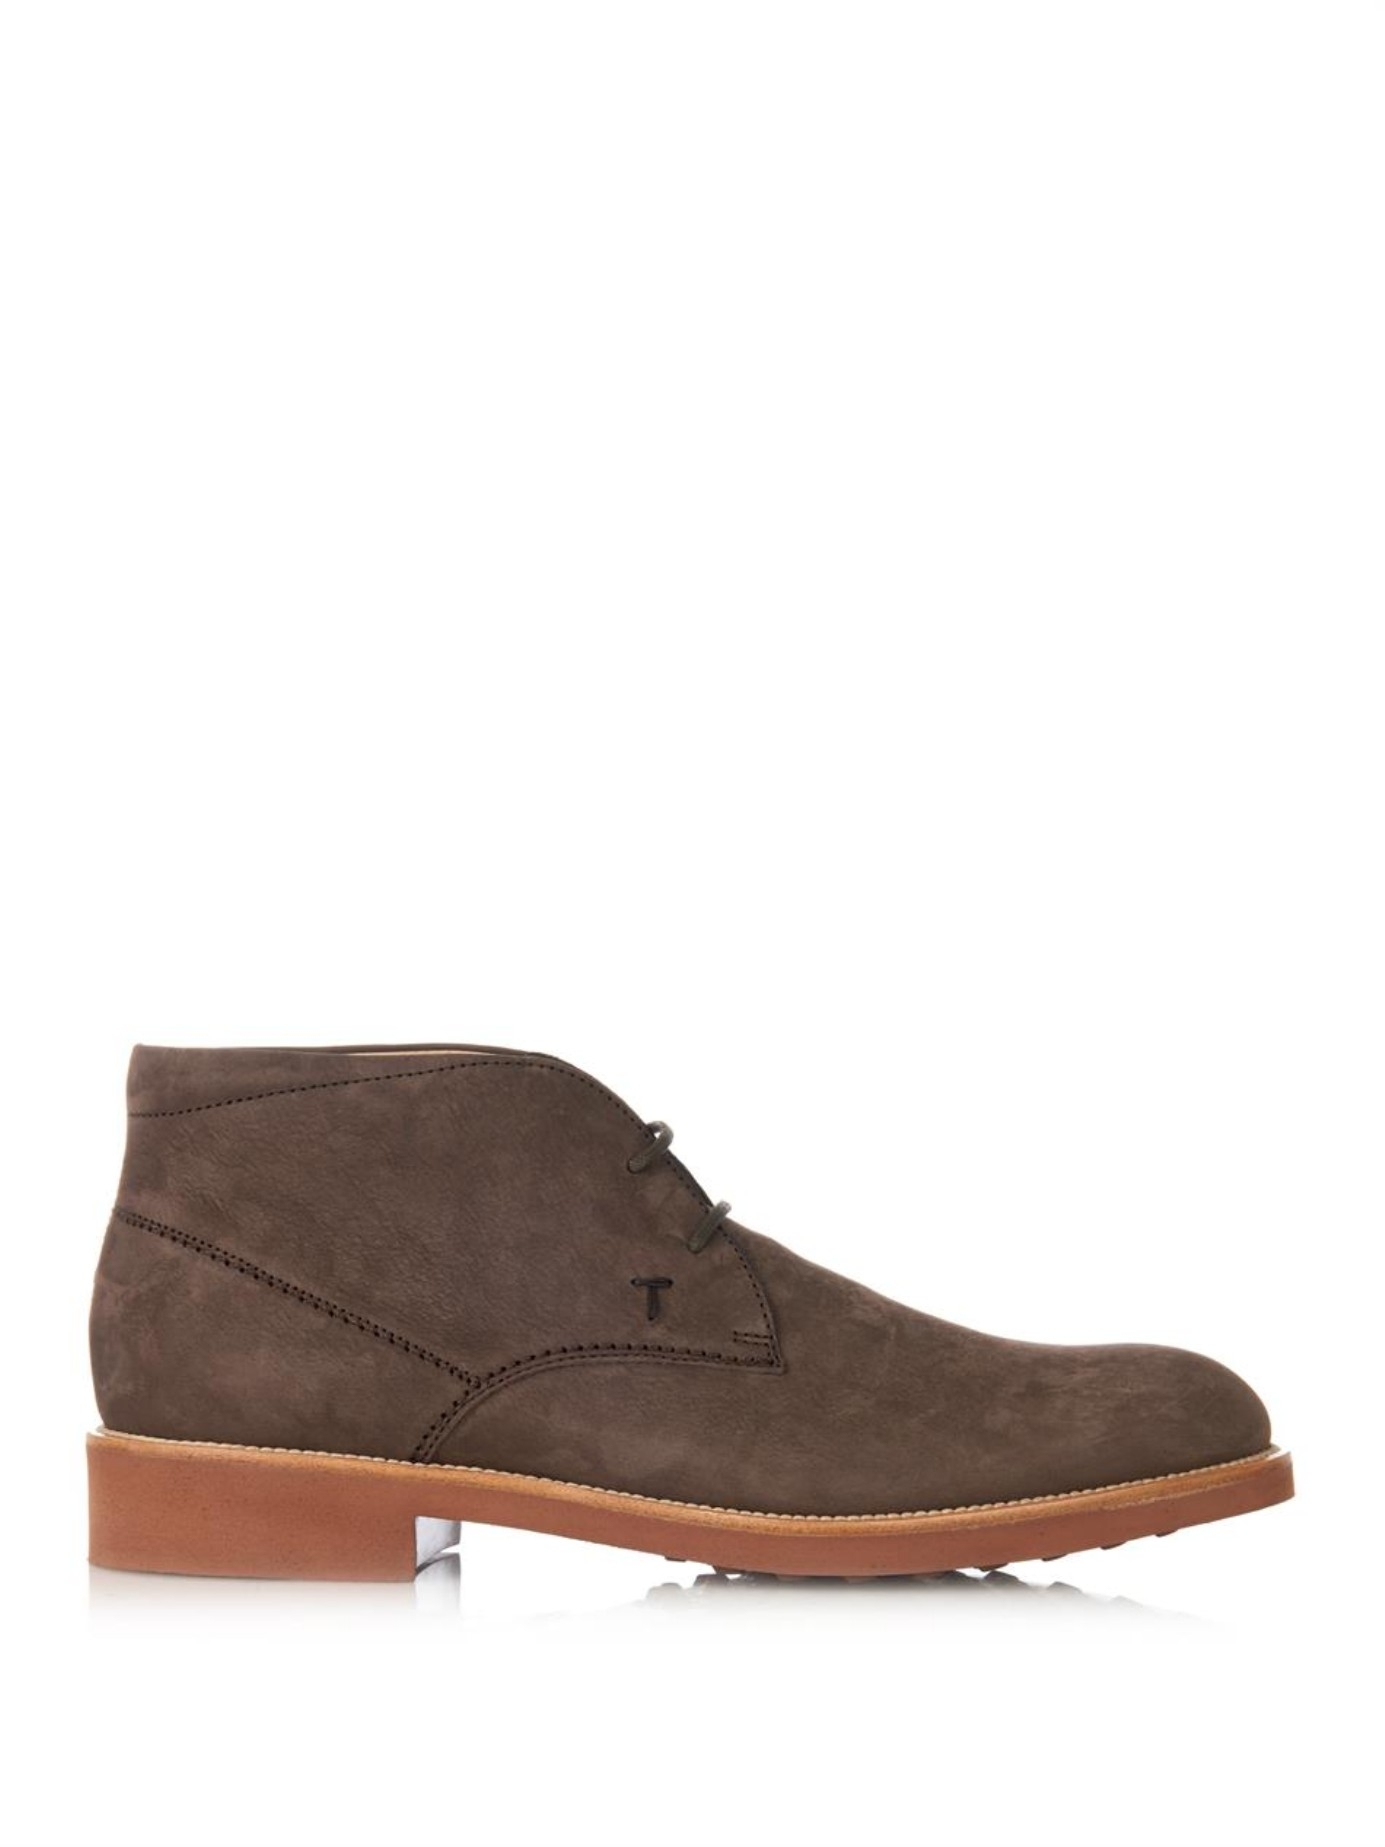 tod 39 s suede desert boots in brown for men lyst. Black Bedroom Furniture Sets. Home Design Ideas